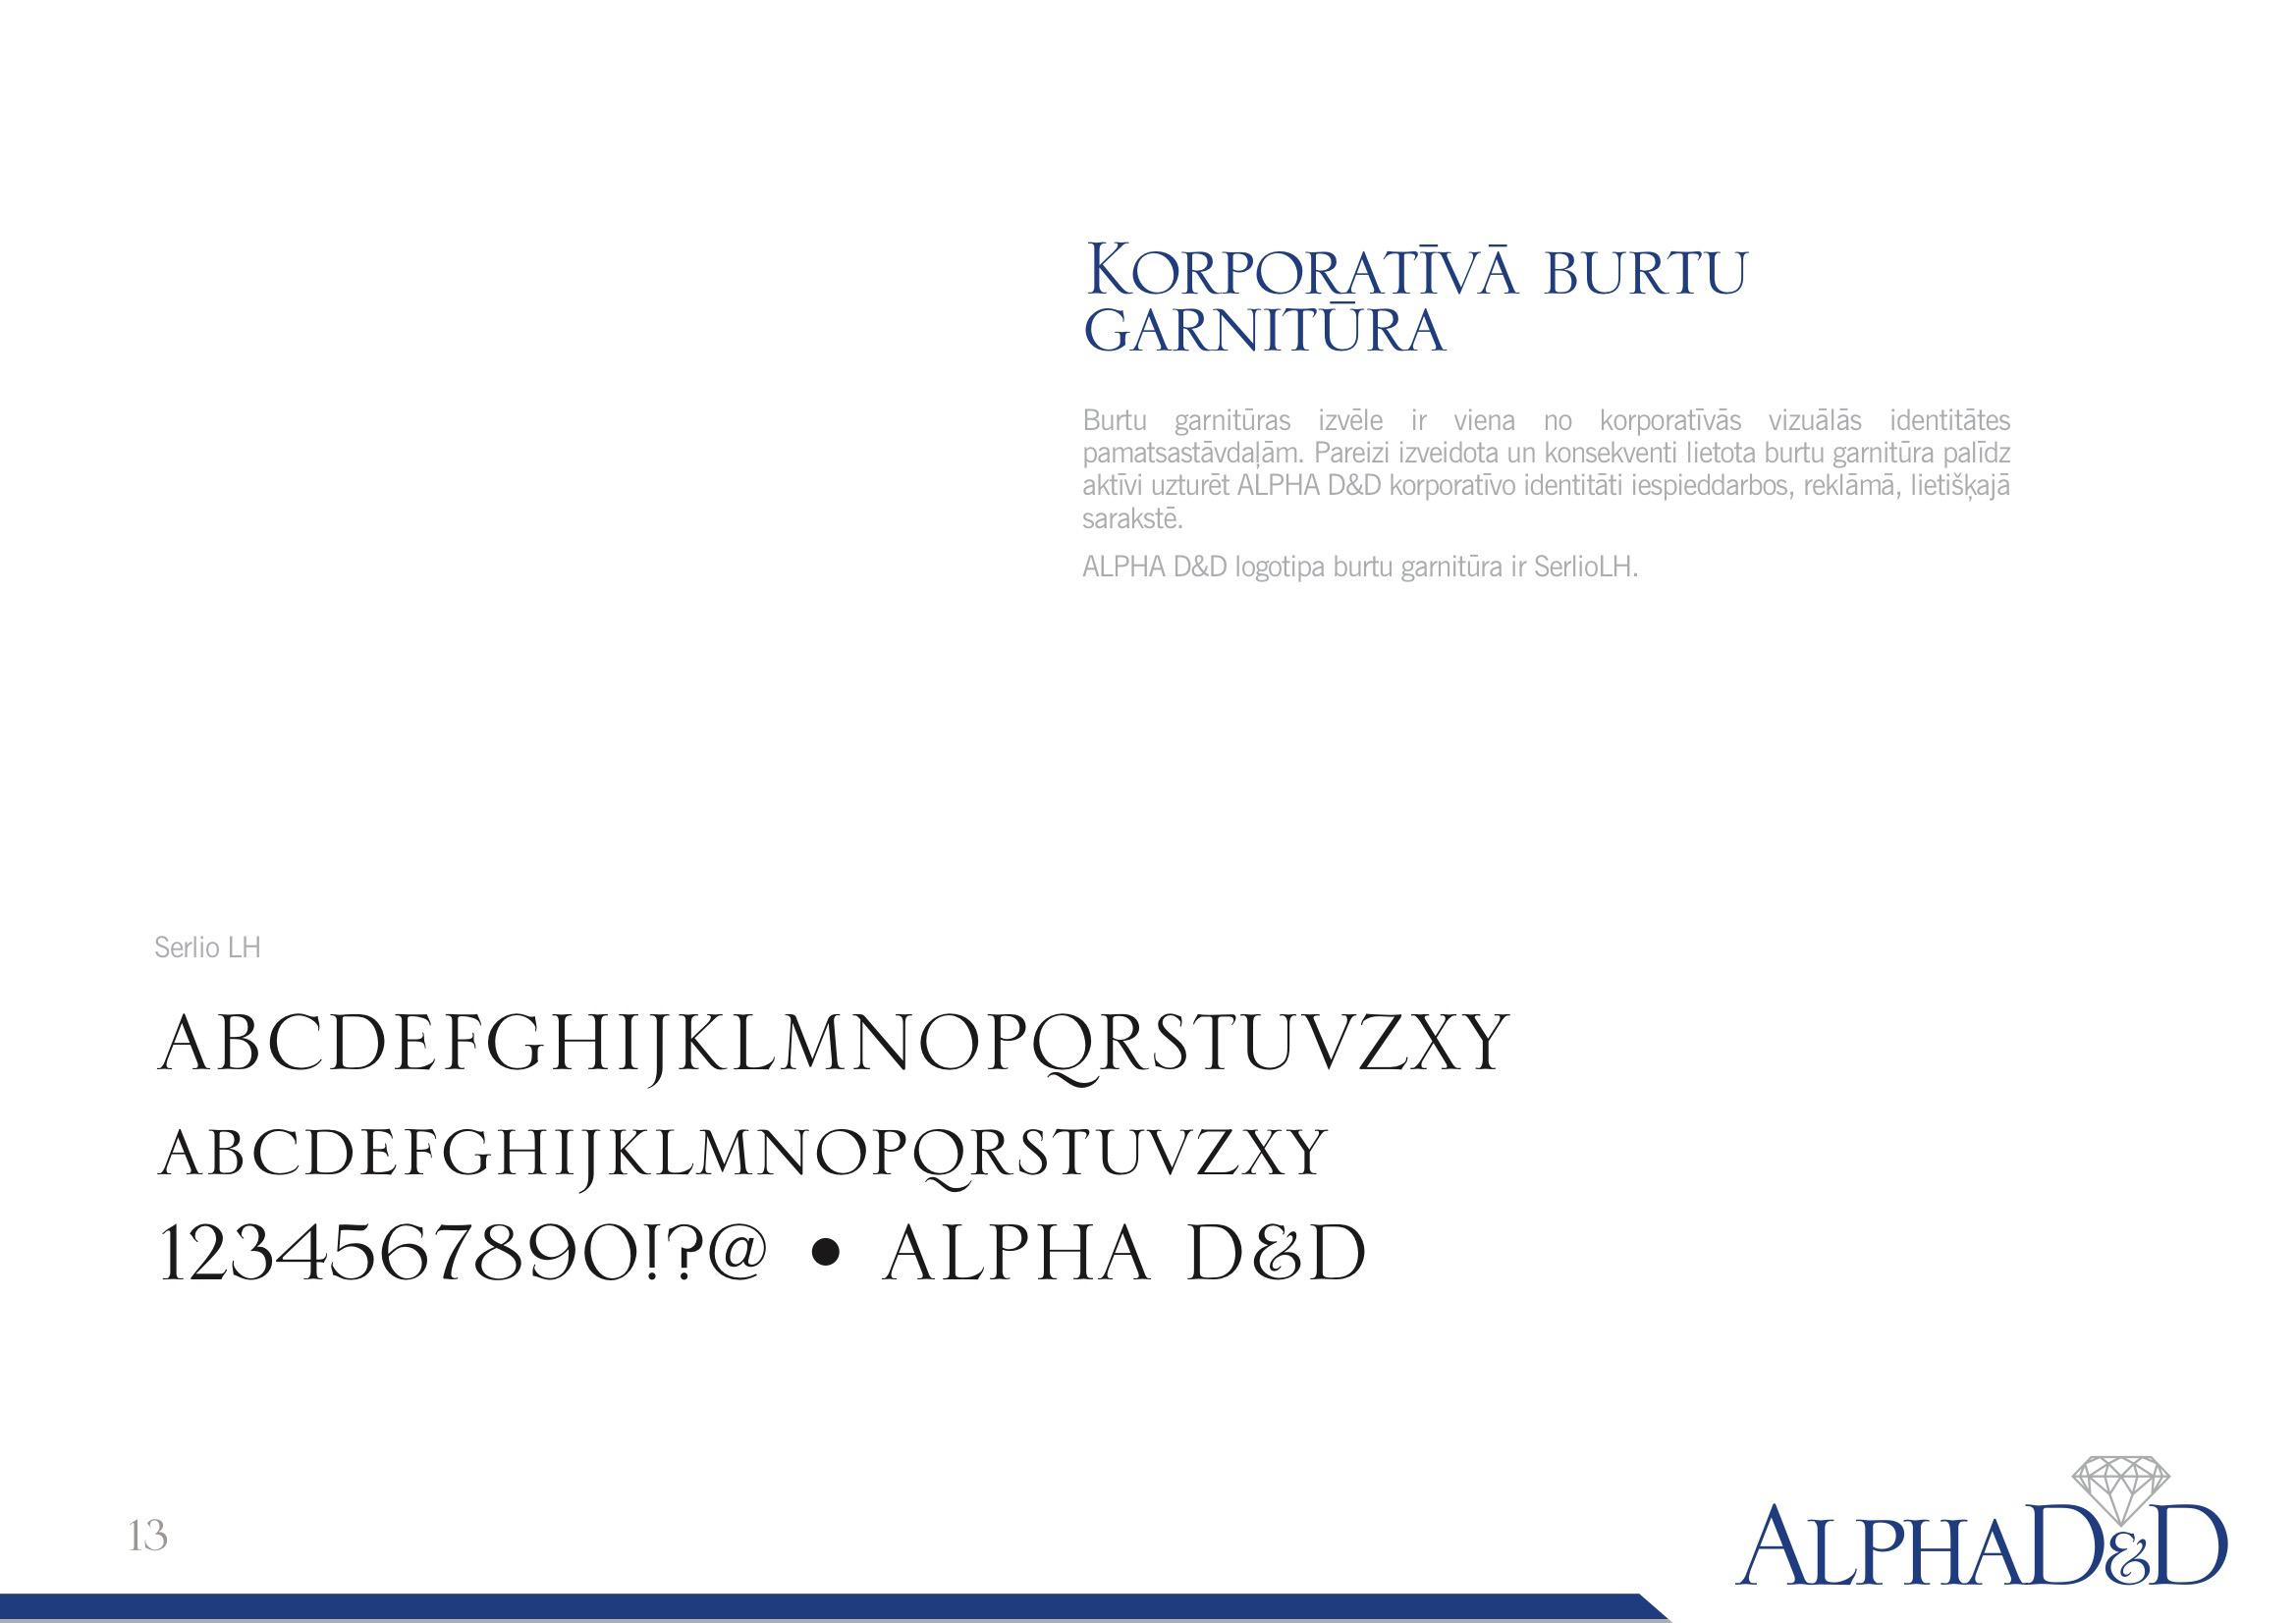 AlphaDD_Stils 13